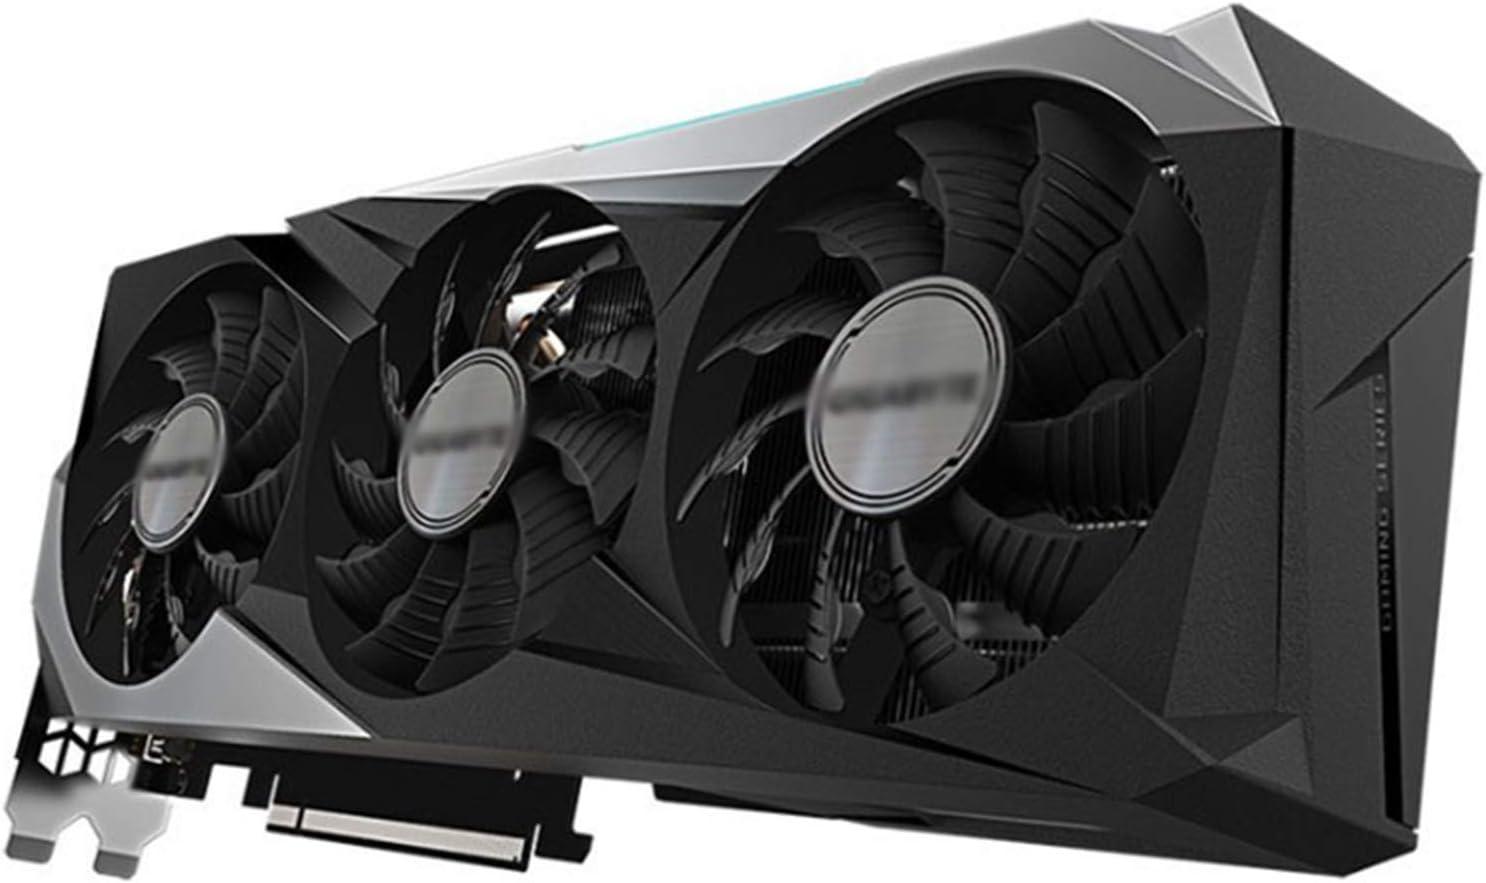 Tarjeta de gráficos GeForce RTX 3060 TI Gaming AC 8G GDDR6 Adaptador de Video 256 bits